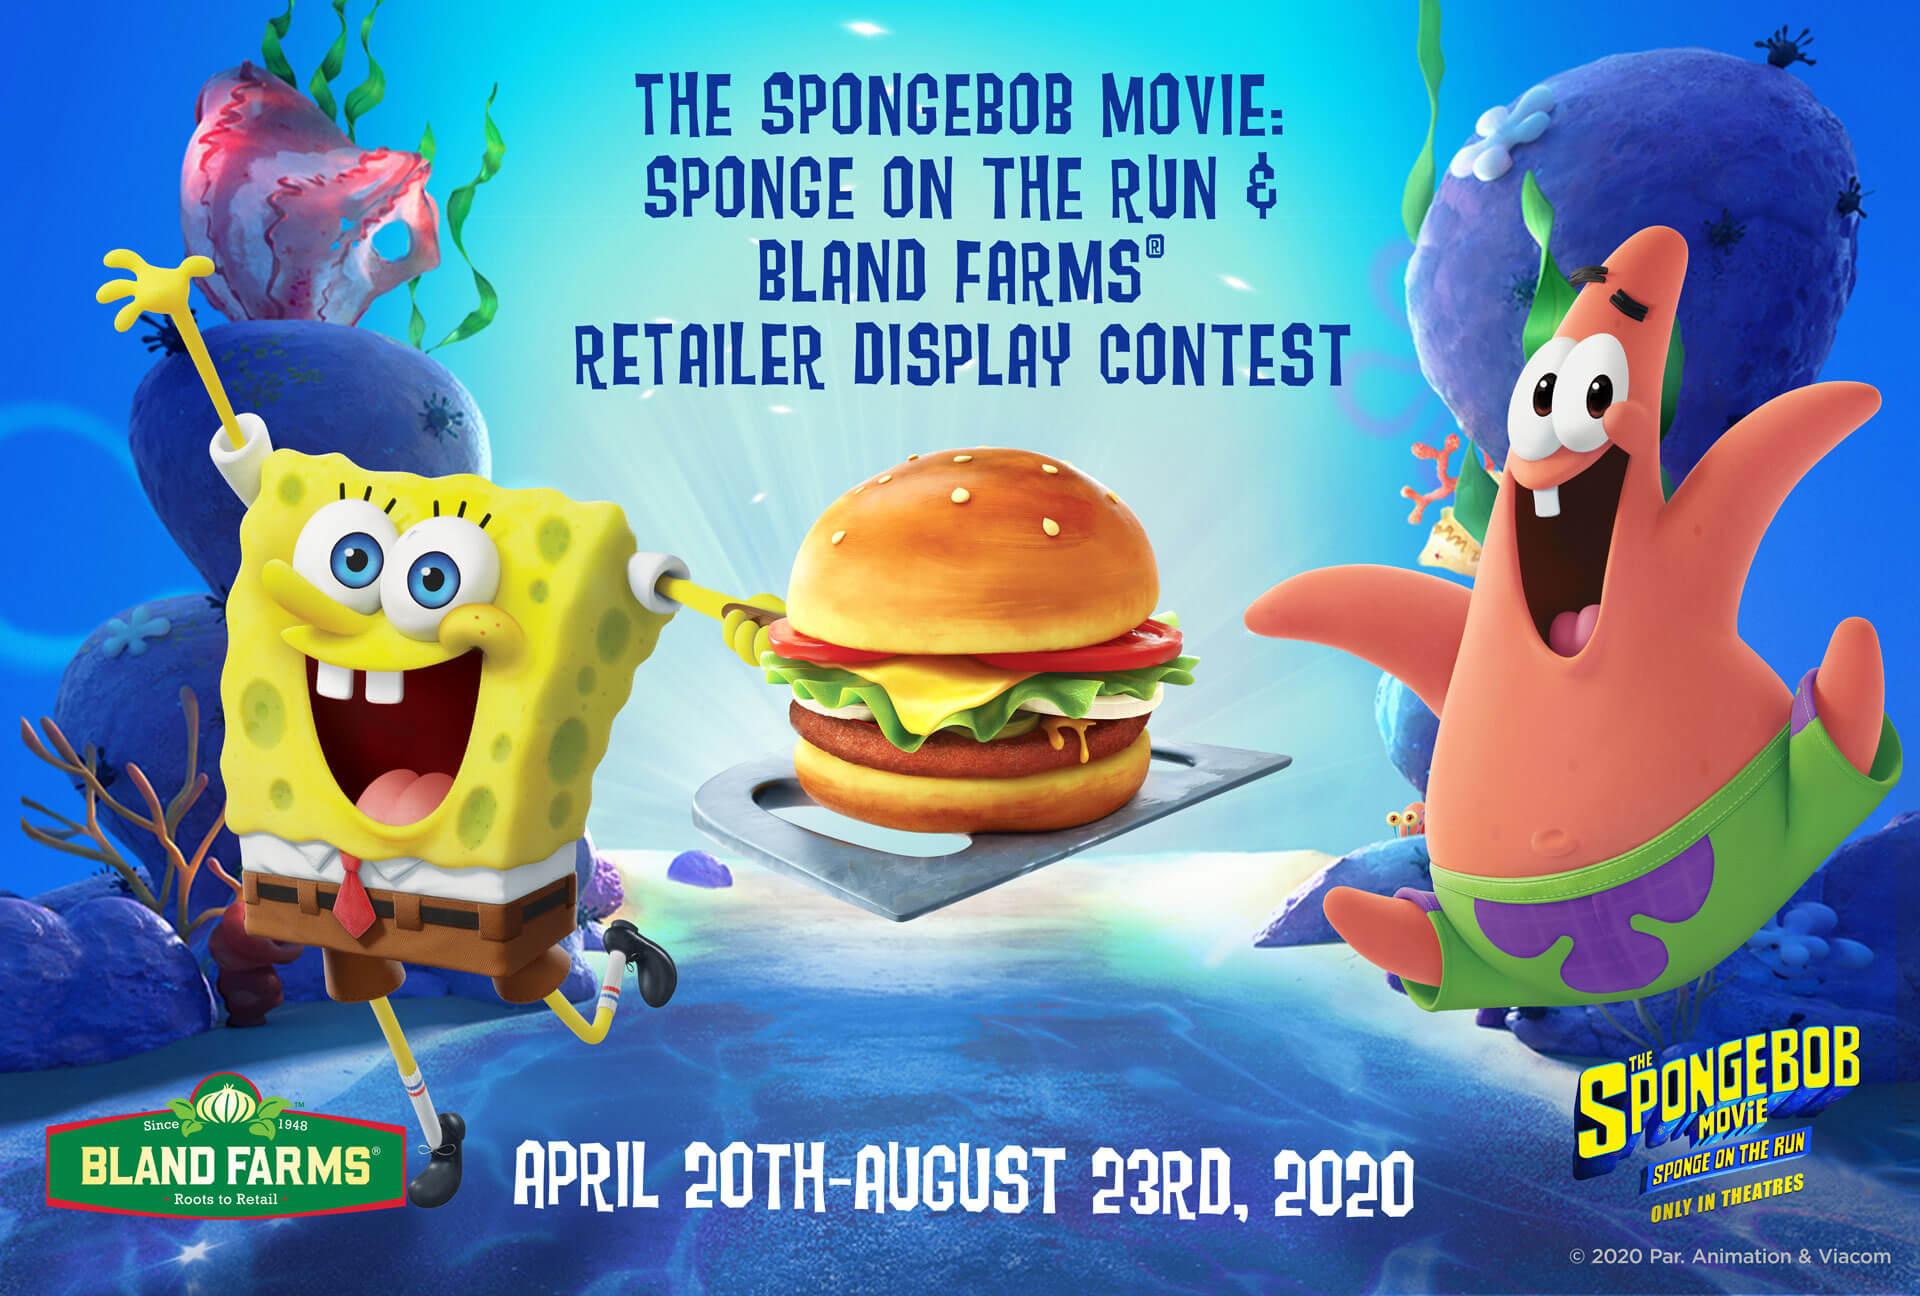 Spongebob Bland Farms Retailer Display Contest